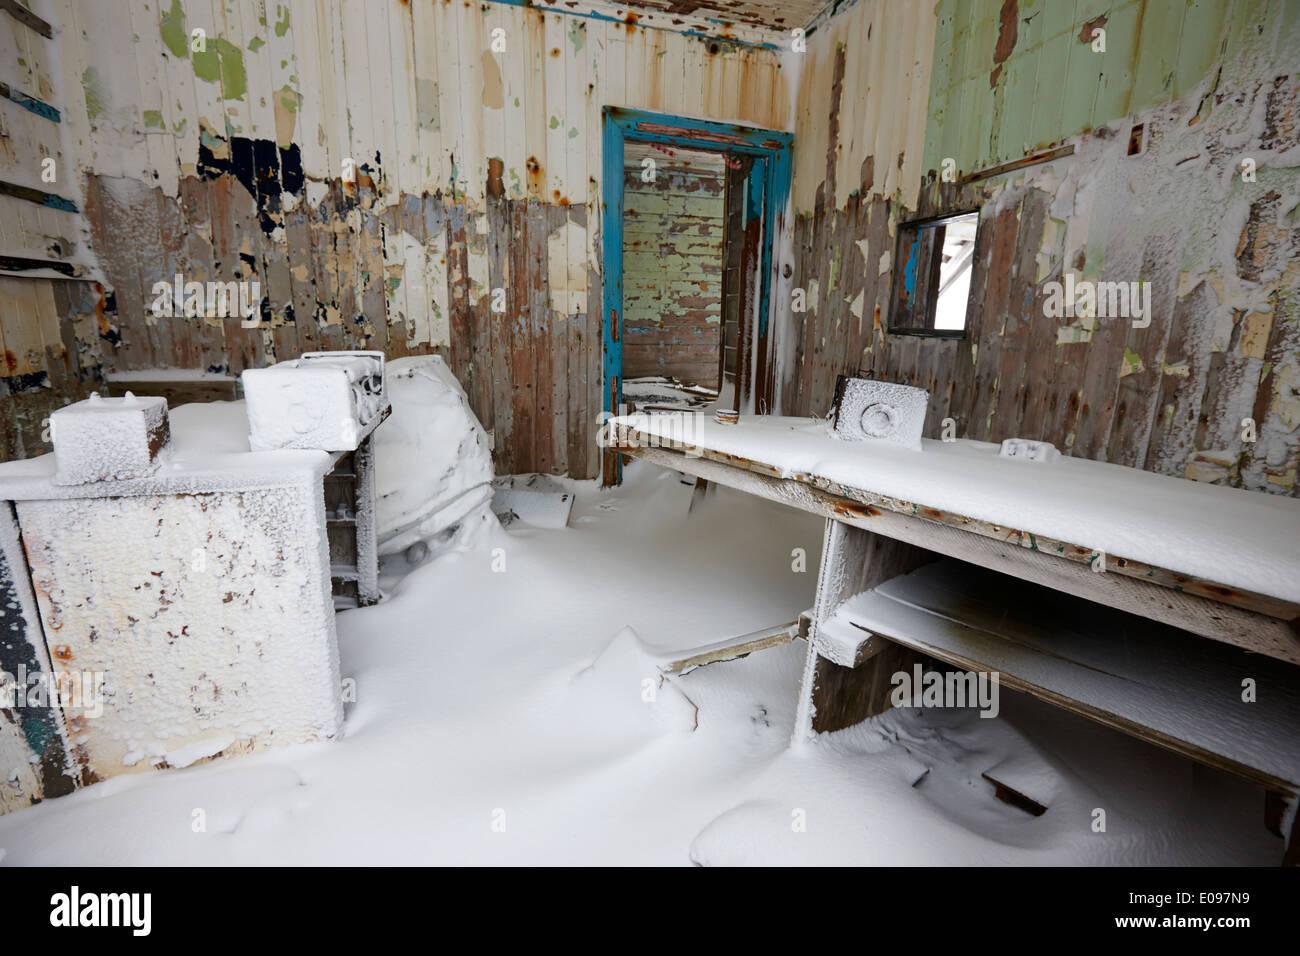 interior of biscoe house former norwegian aktieselskabet hektor whaling station whalers bay deception island Antarctica - Stock Image